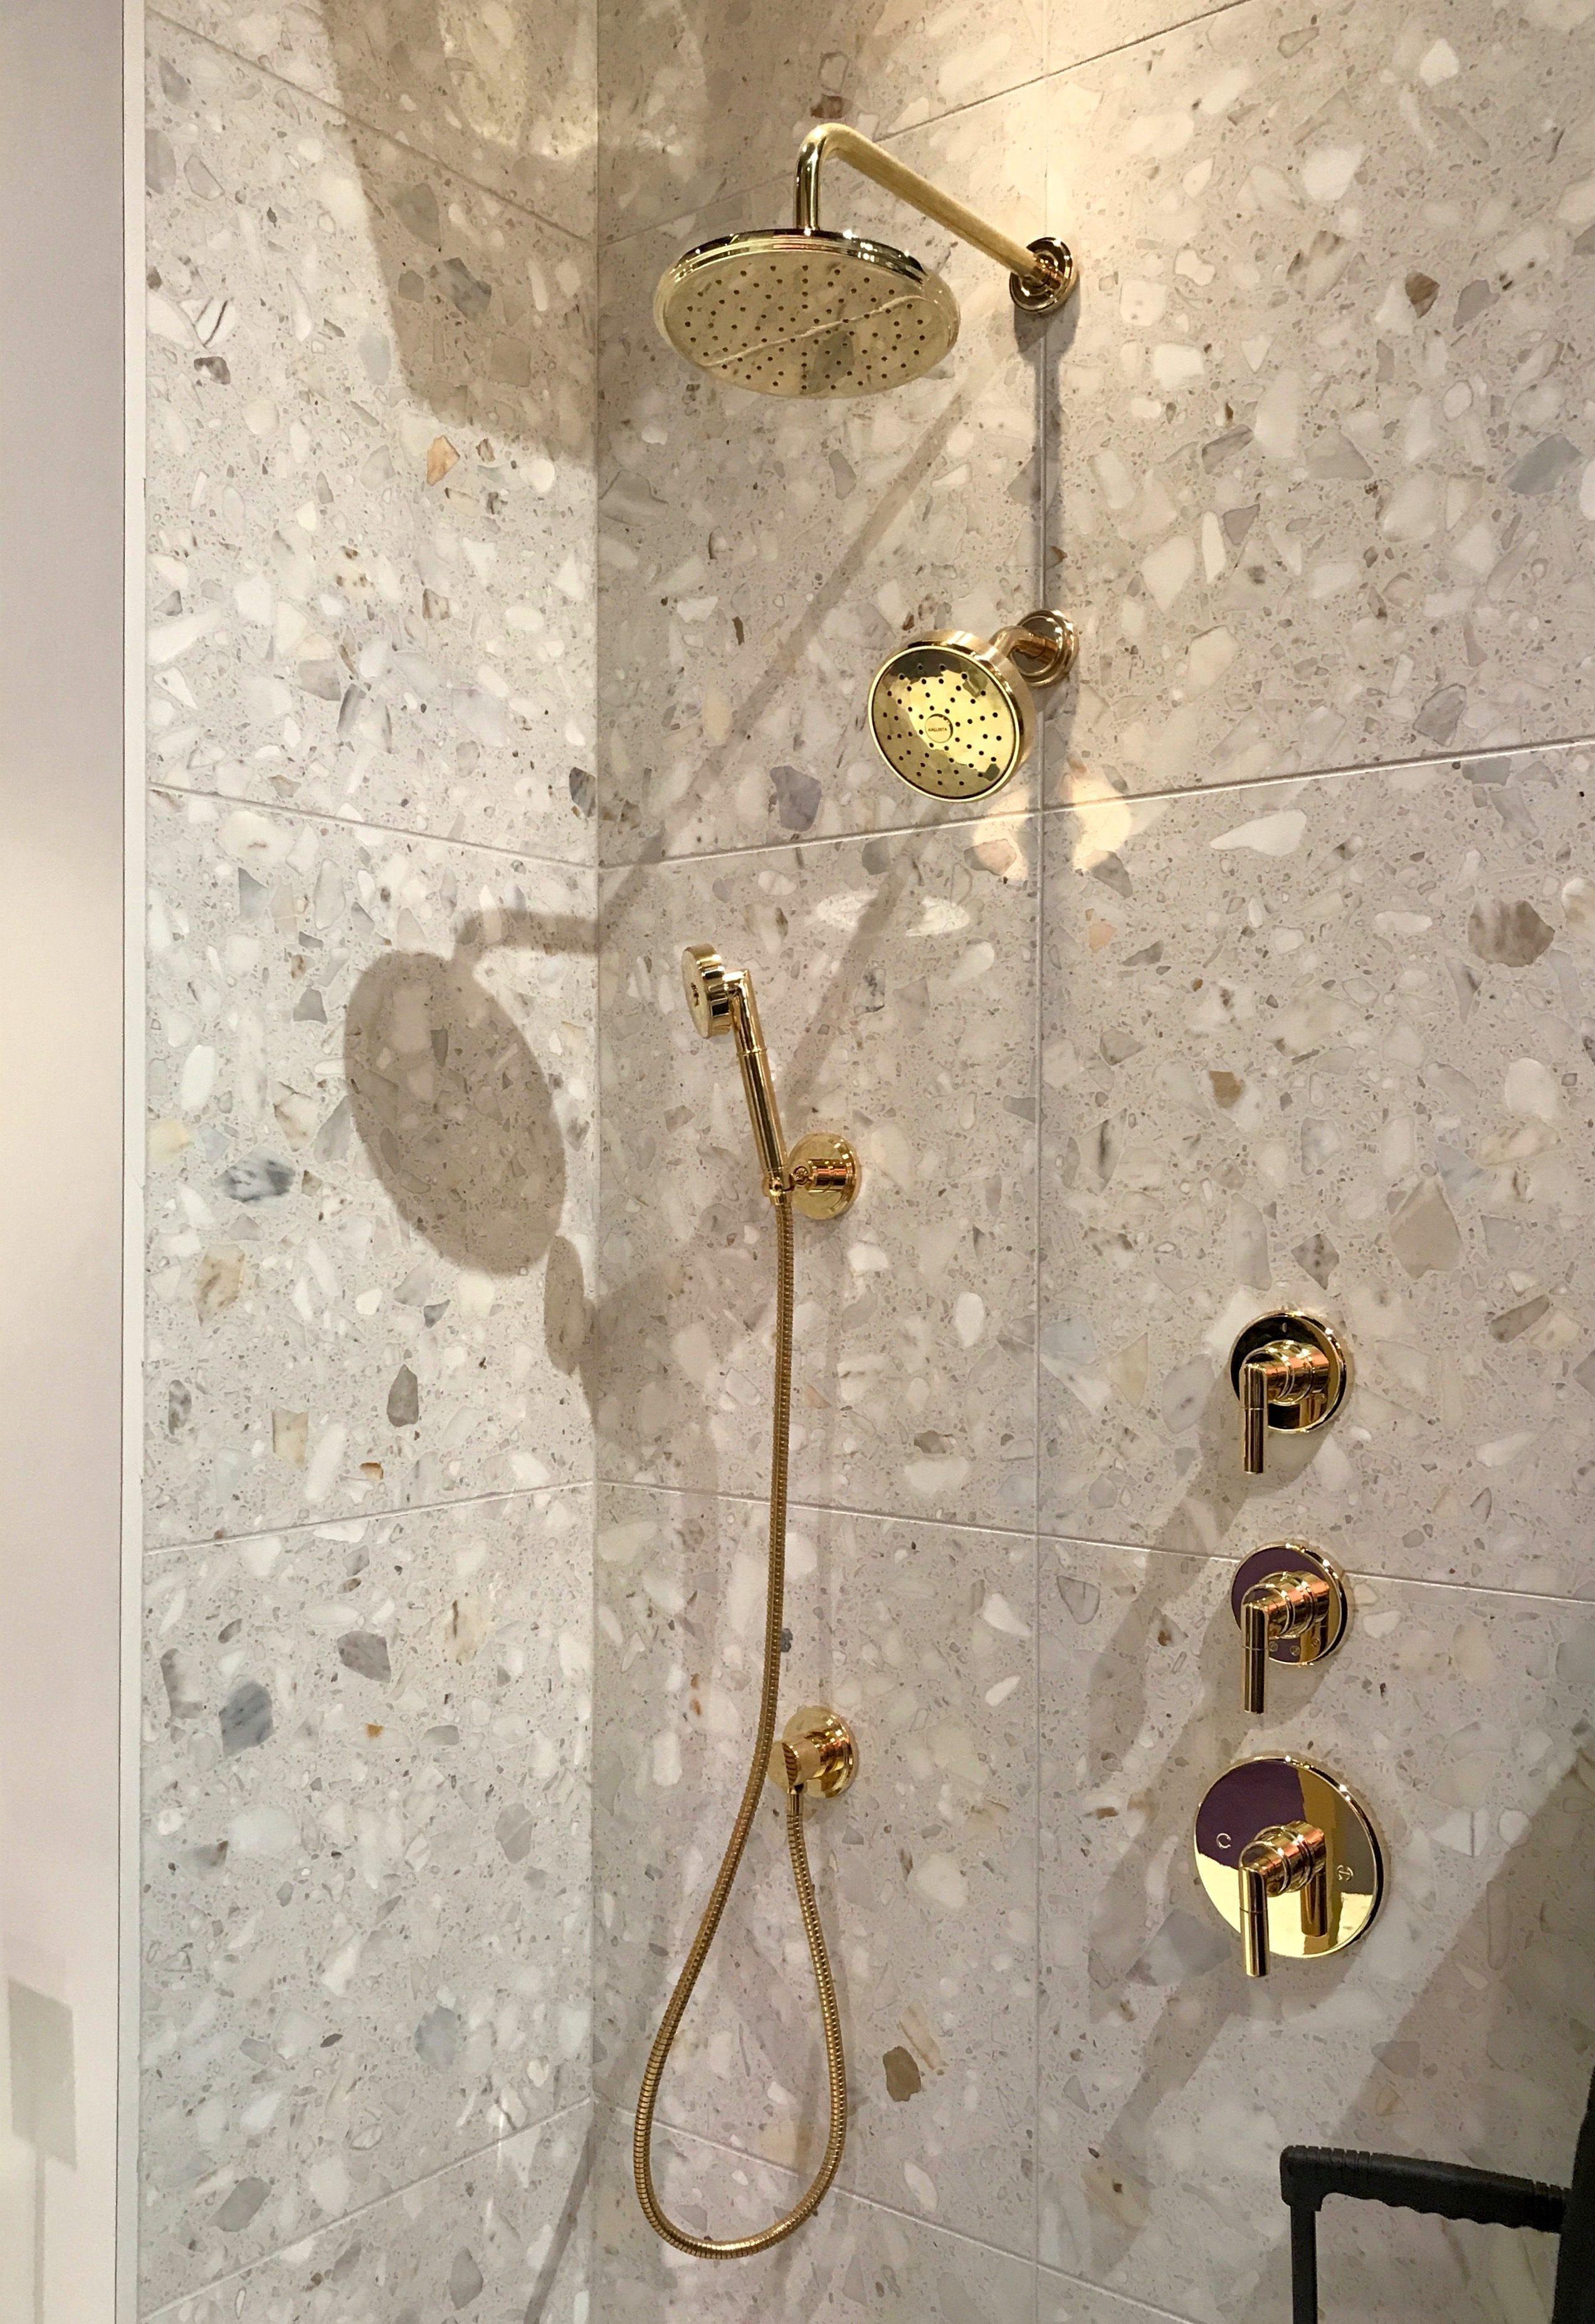 Kohler Brass Shower Fixtures Kbis2019 Designhoundskbis